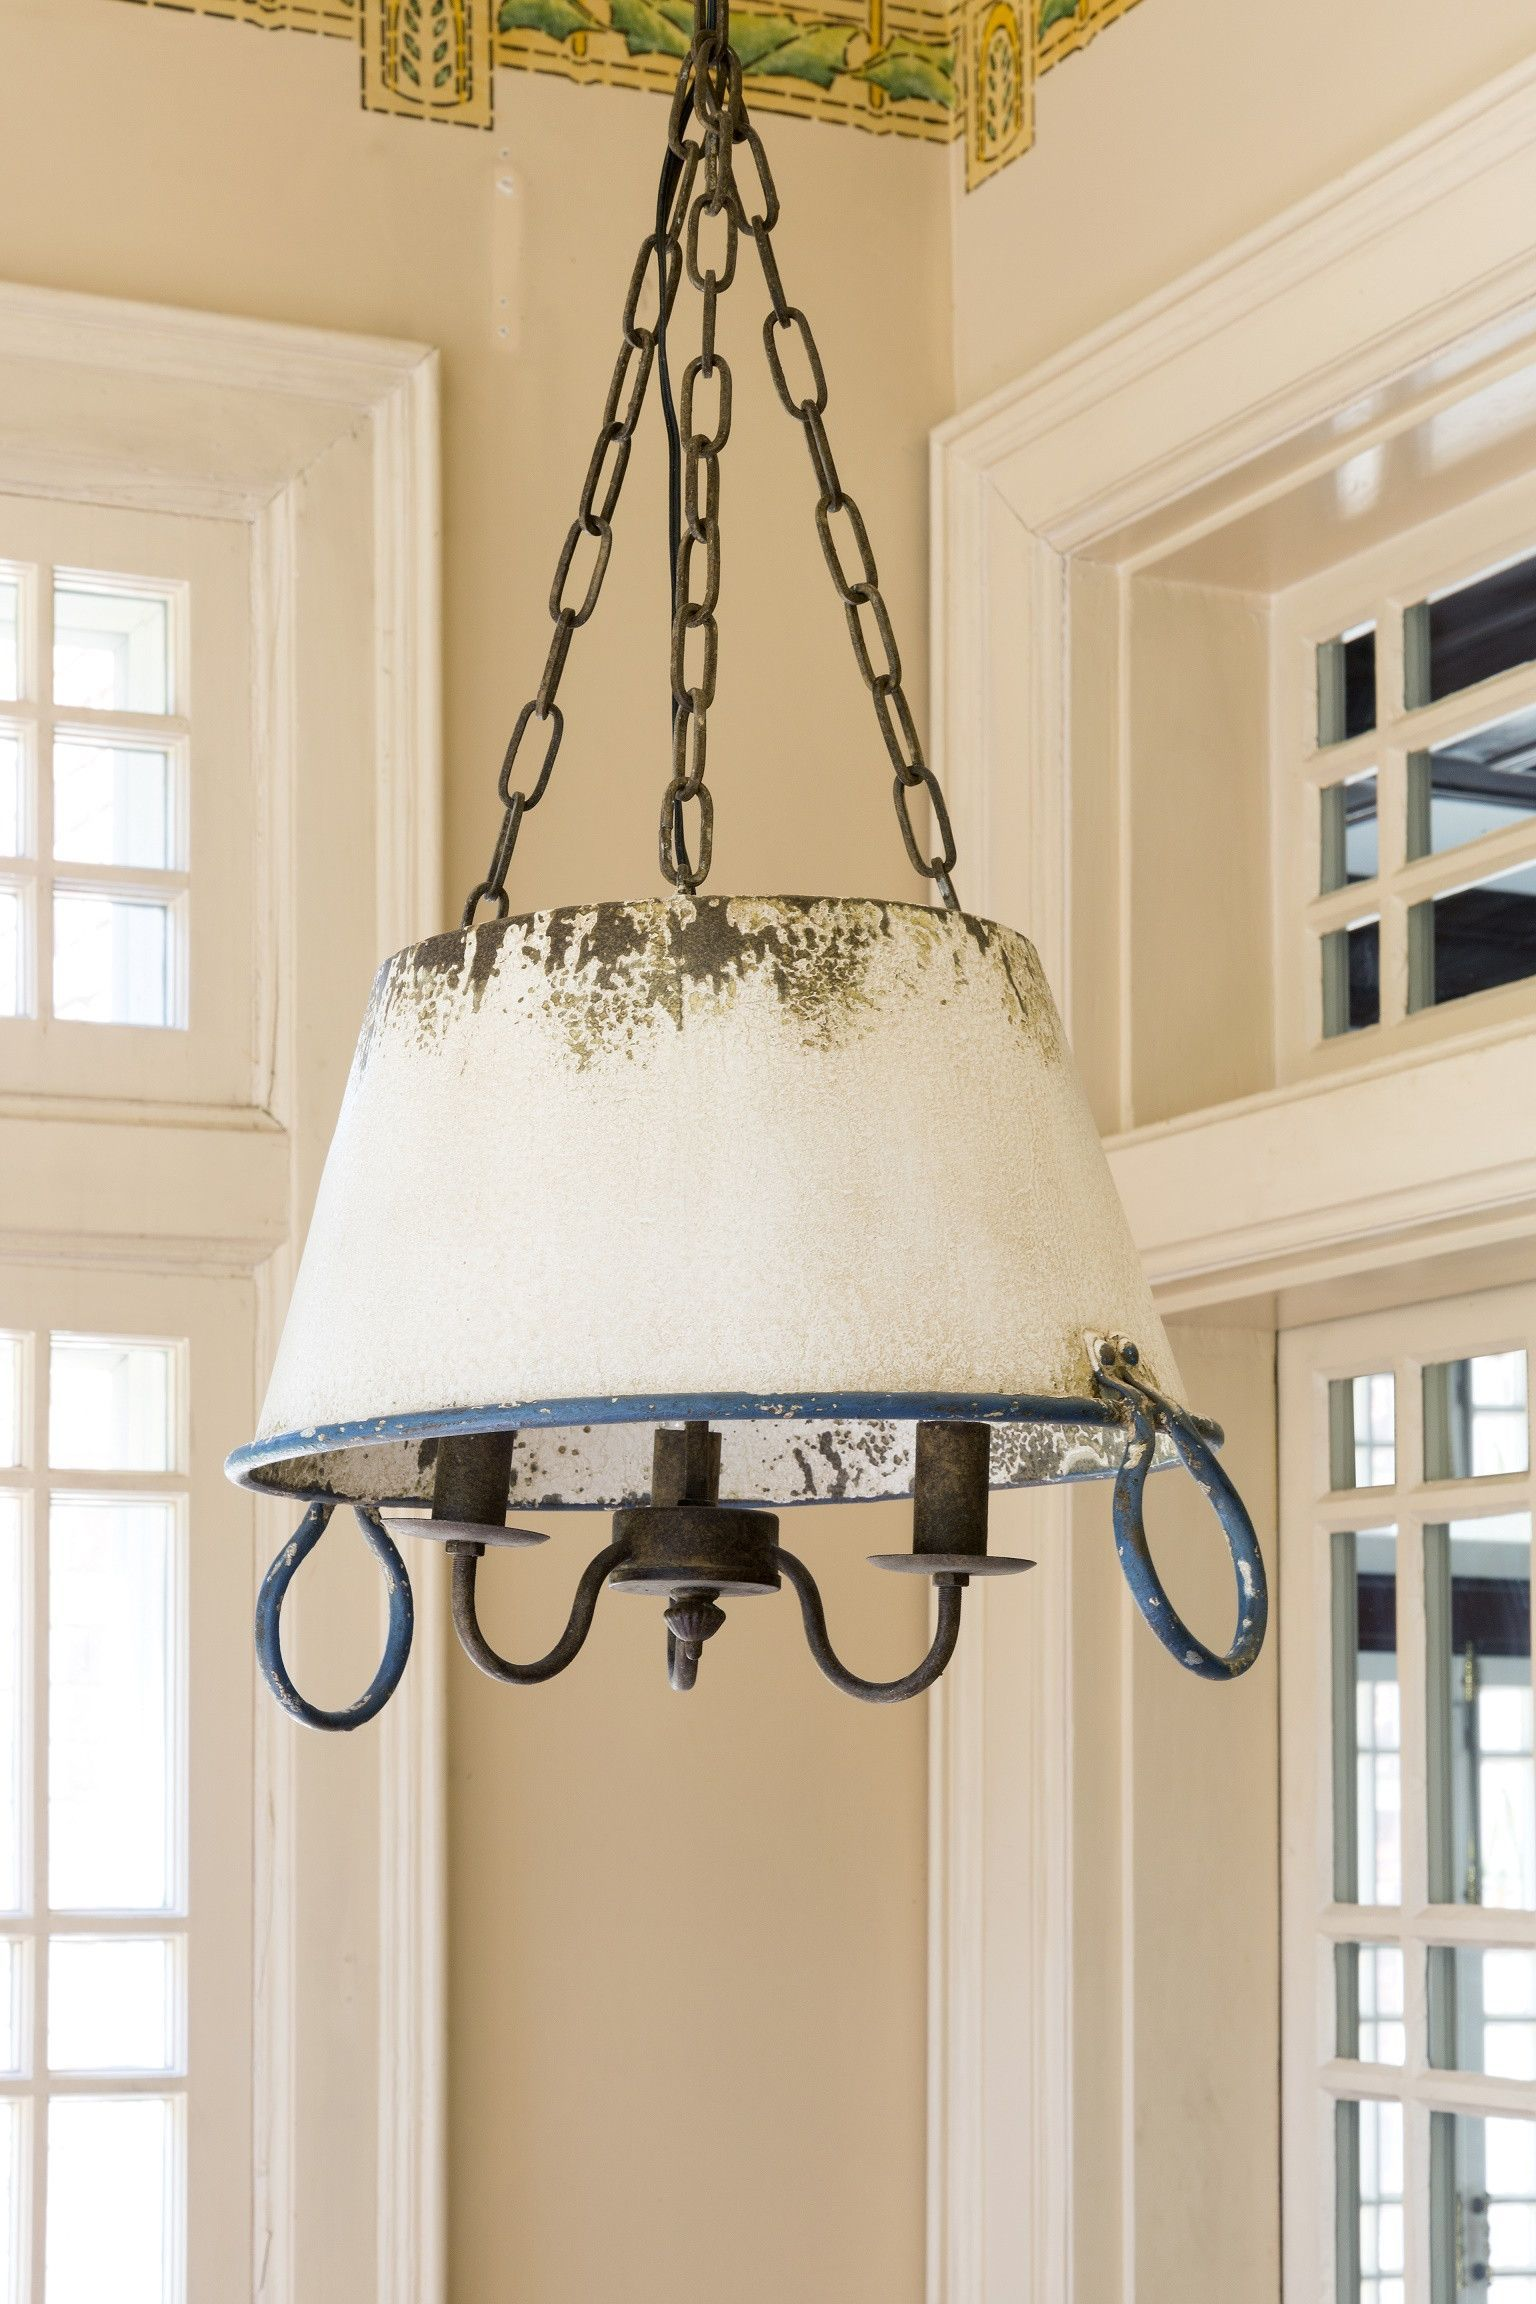 Soup pot pendant light fixture pendant lighting pendants and lights soup pot pendant light fixture arubaitofo Gallery